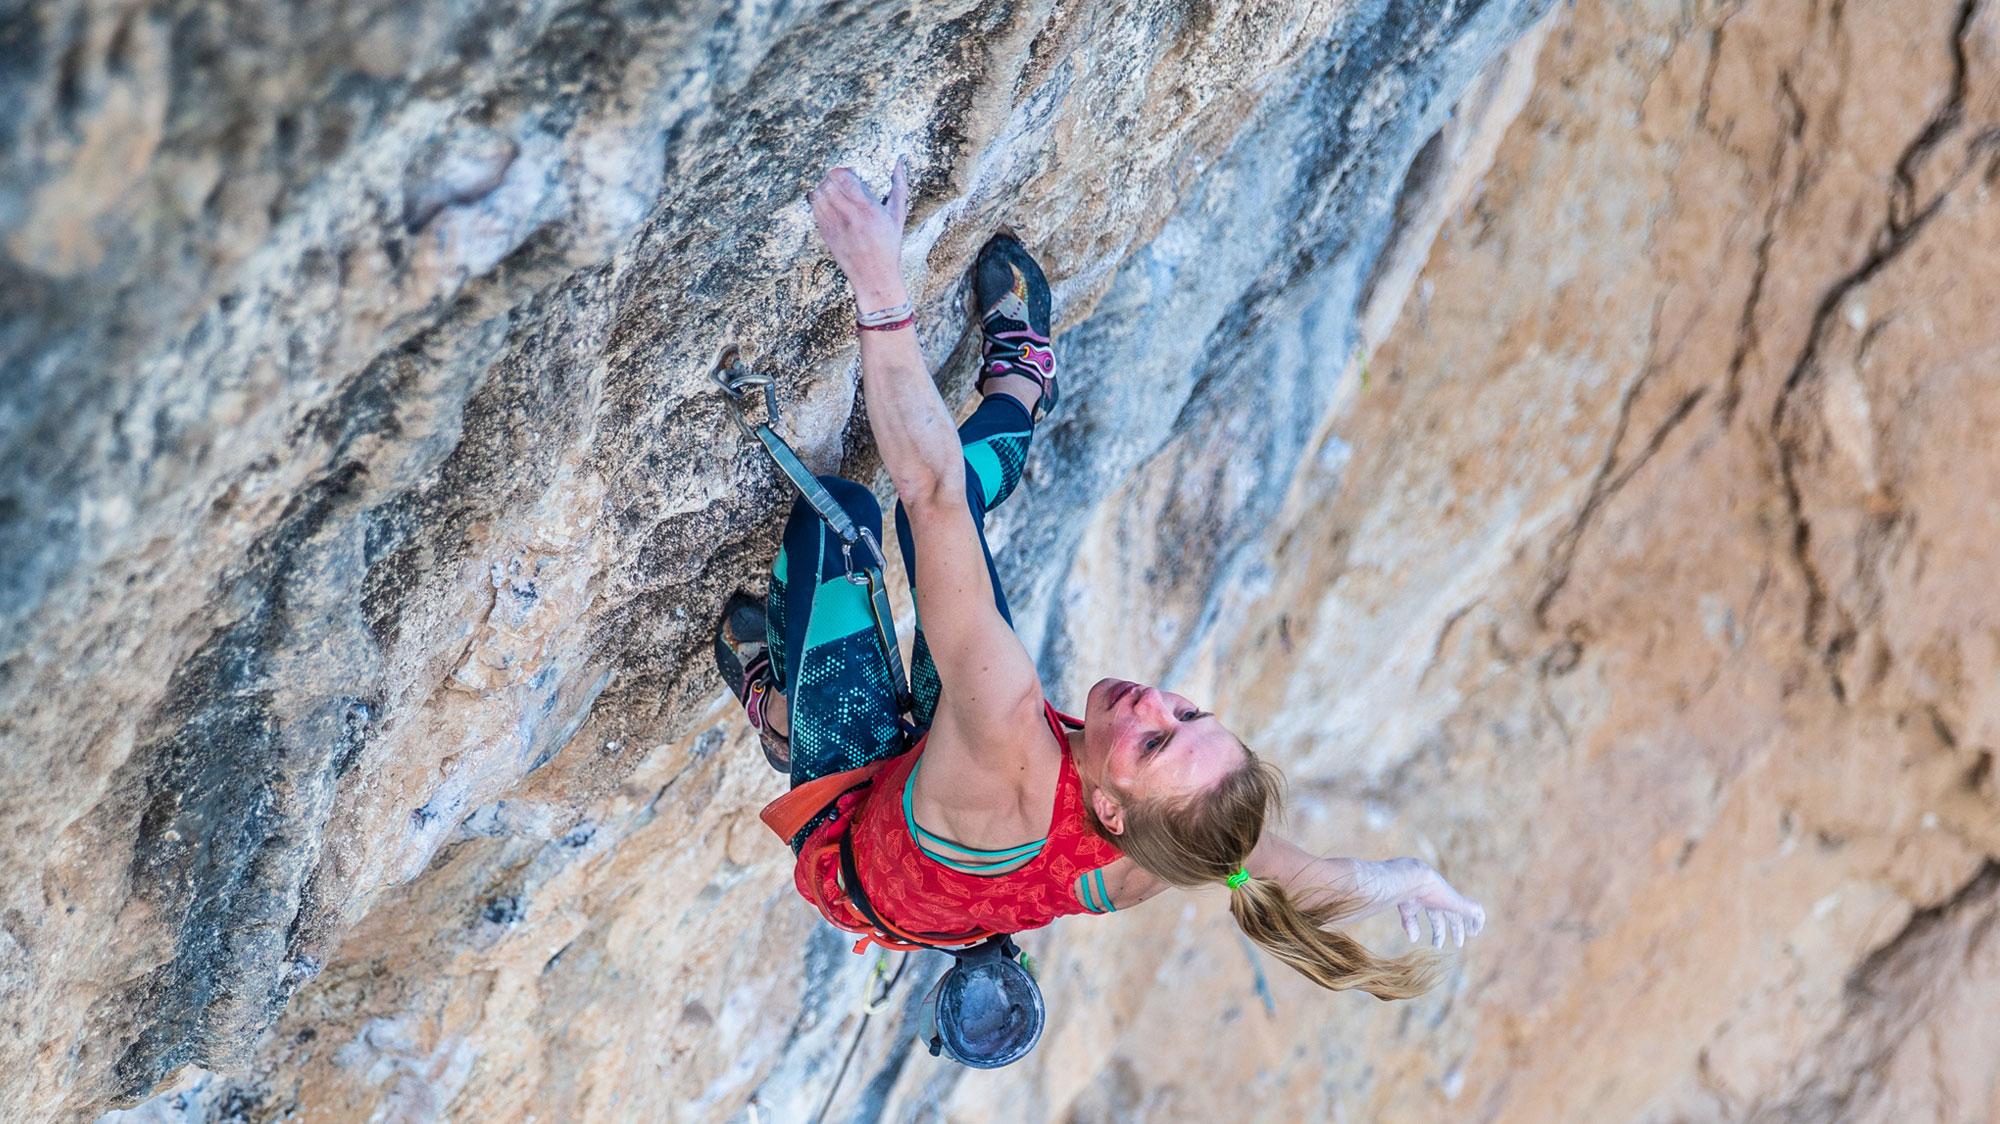 Neverending miracle - Martina Demmel punktet ihre erste 9a